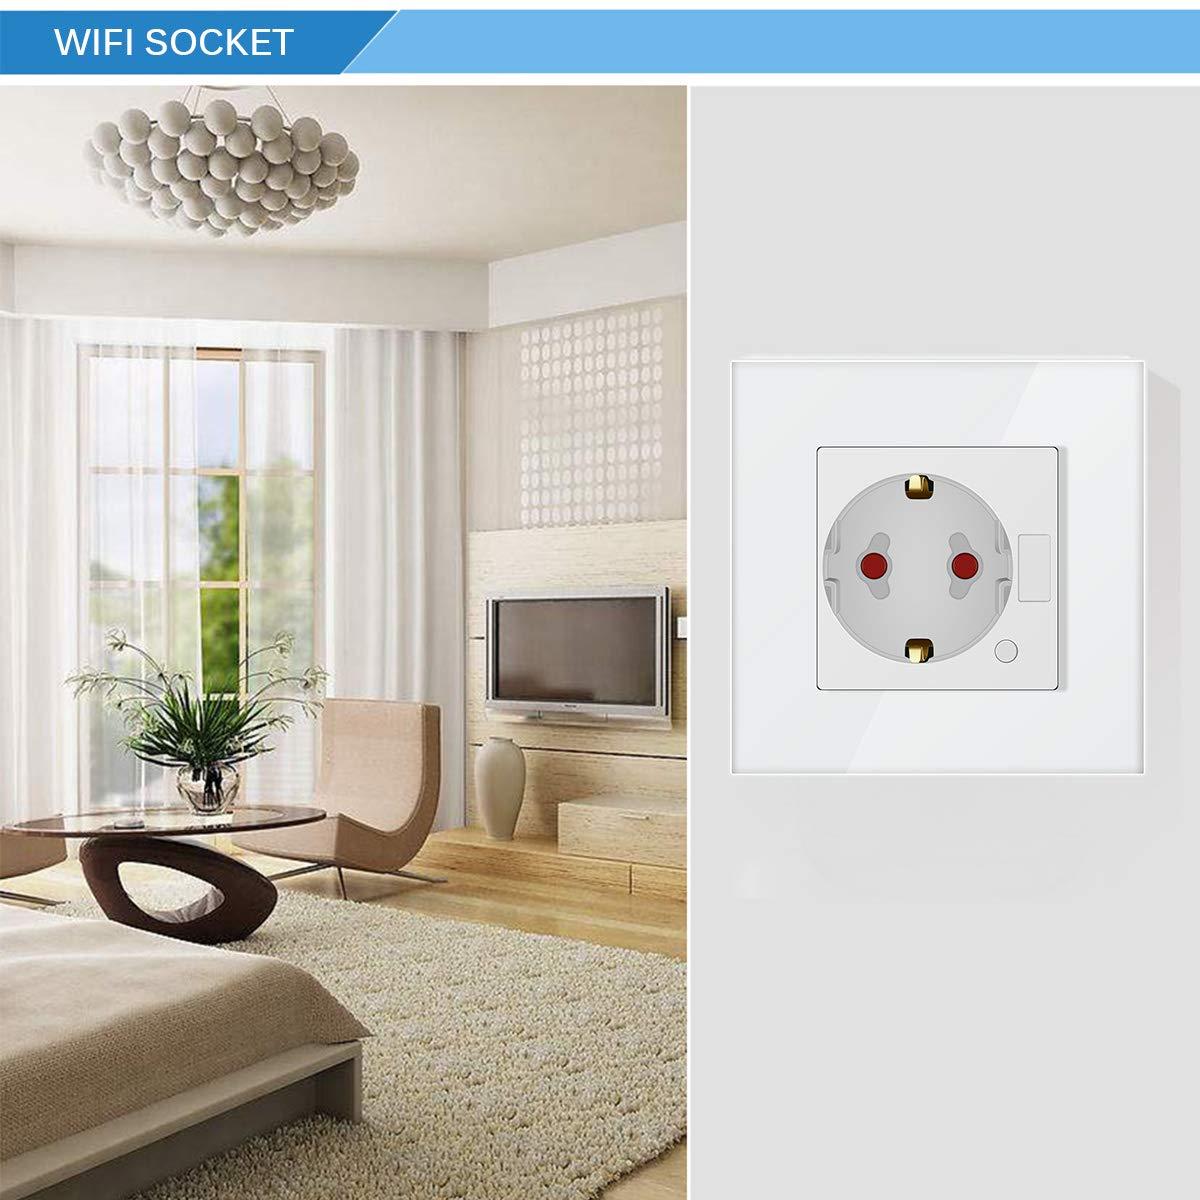 Blanco OurLeeme WiFi Enchufe Inteligente Enchufe de Pared de 10A Toma de Corriente Inteligente Control Remoto Control de Voz Temporizador Ahorro de energ/ía Funciona con Alexa Google Home